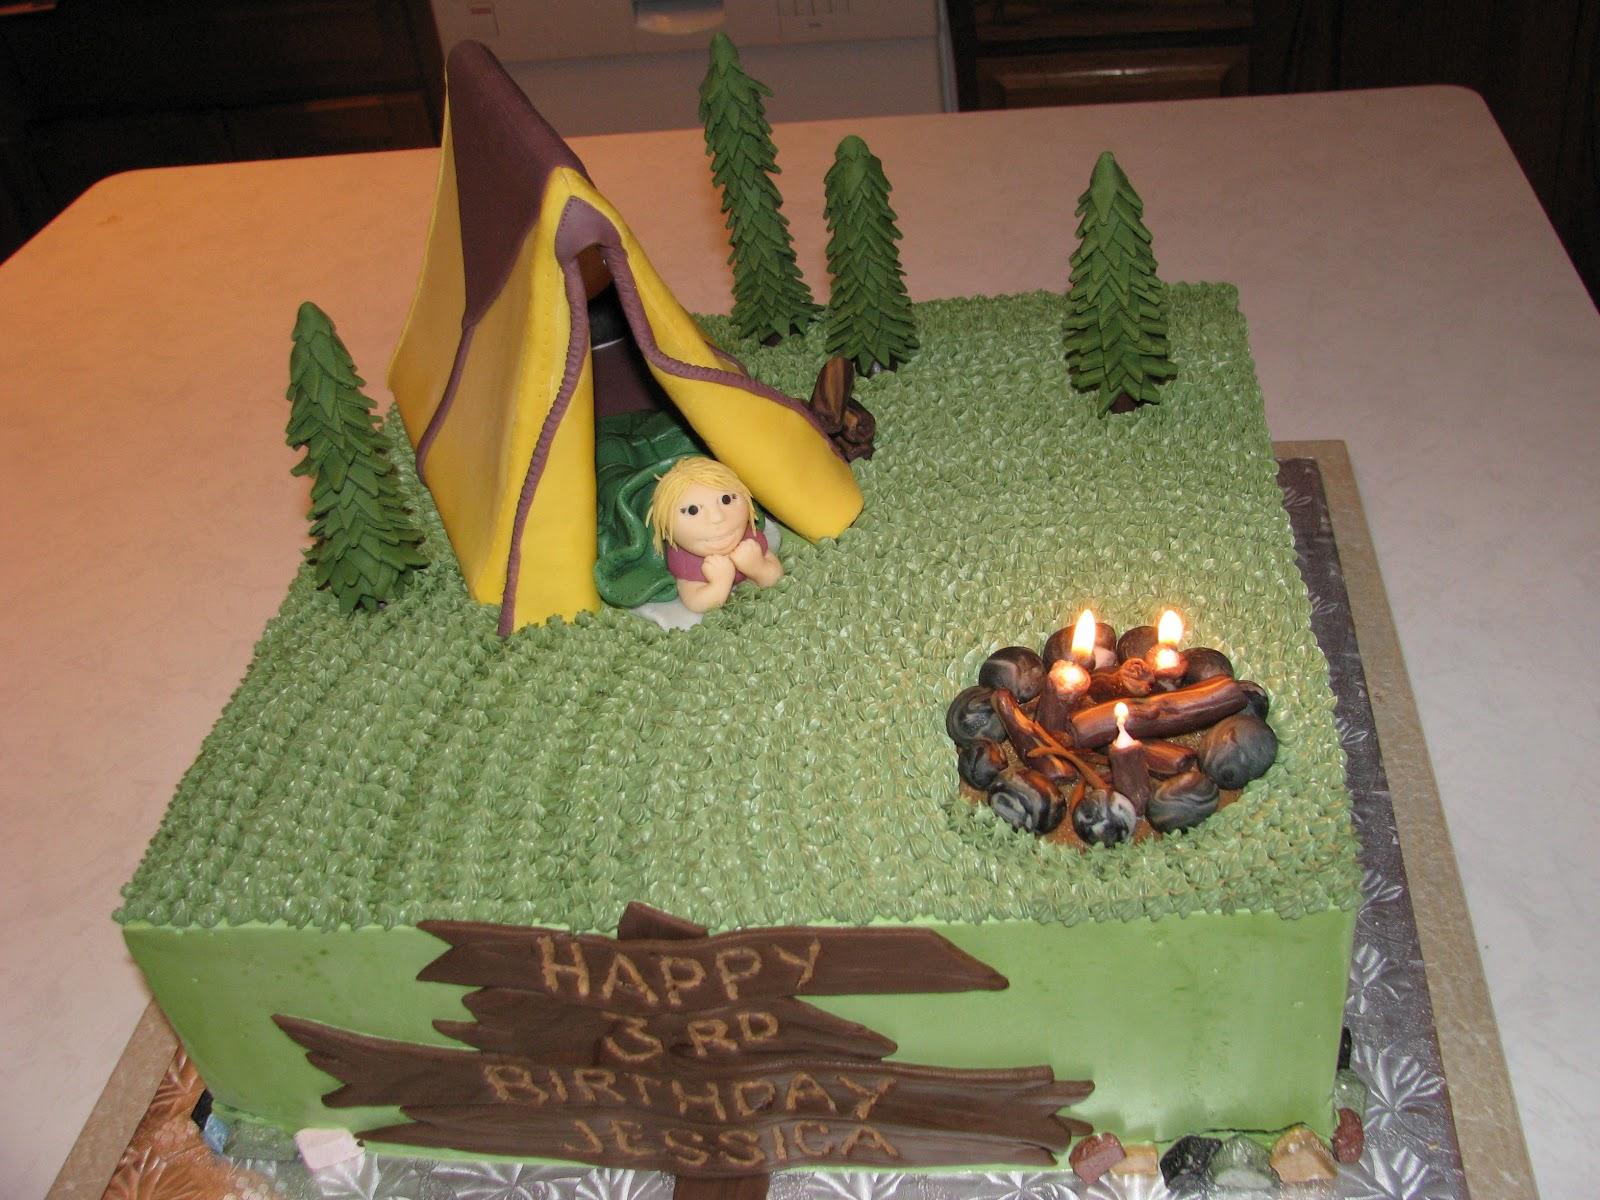 Smitten Birthday Cake